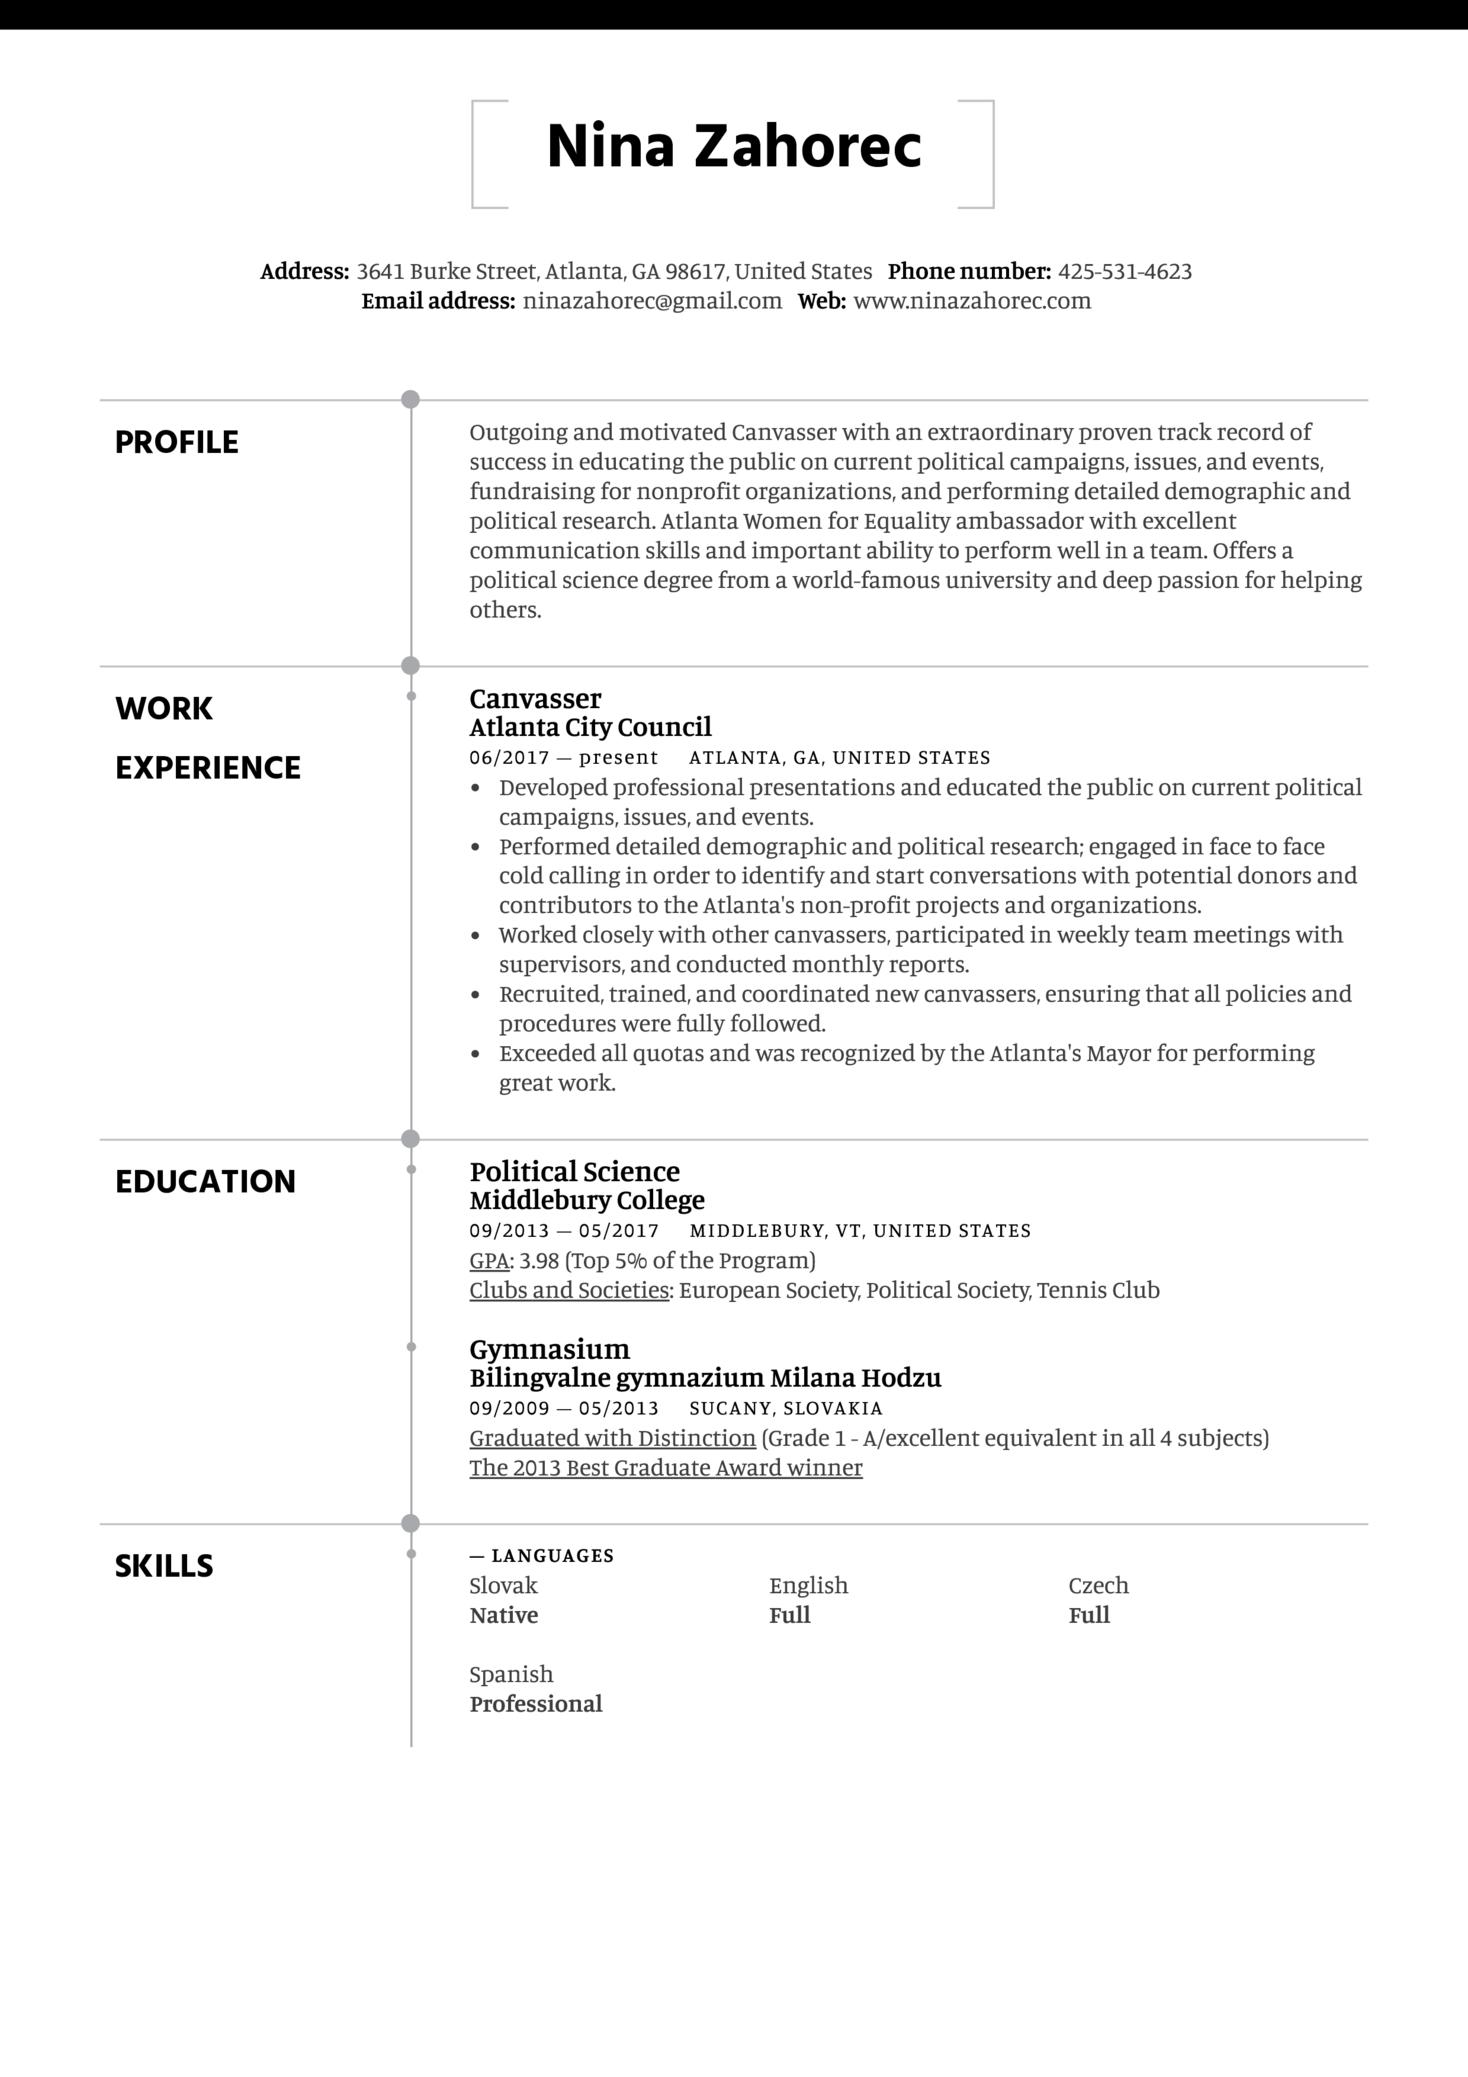 Canvasser Resume Sample (Part 1)